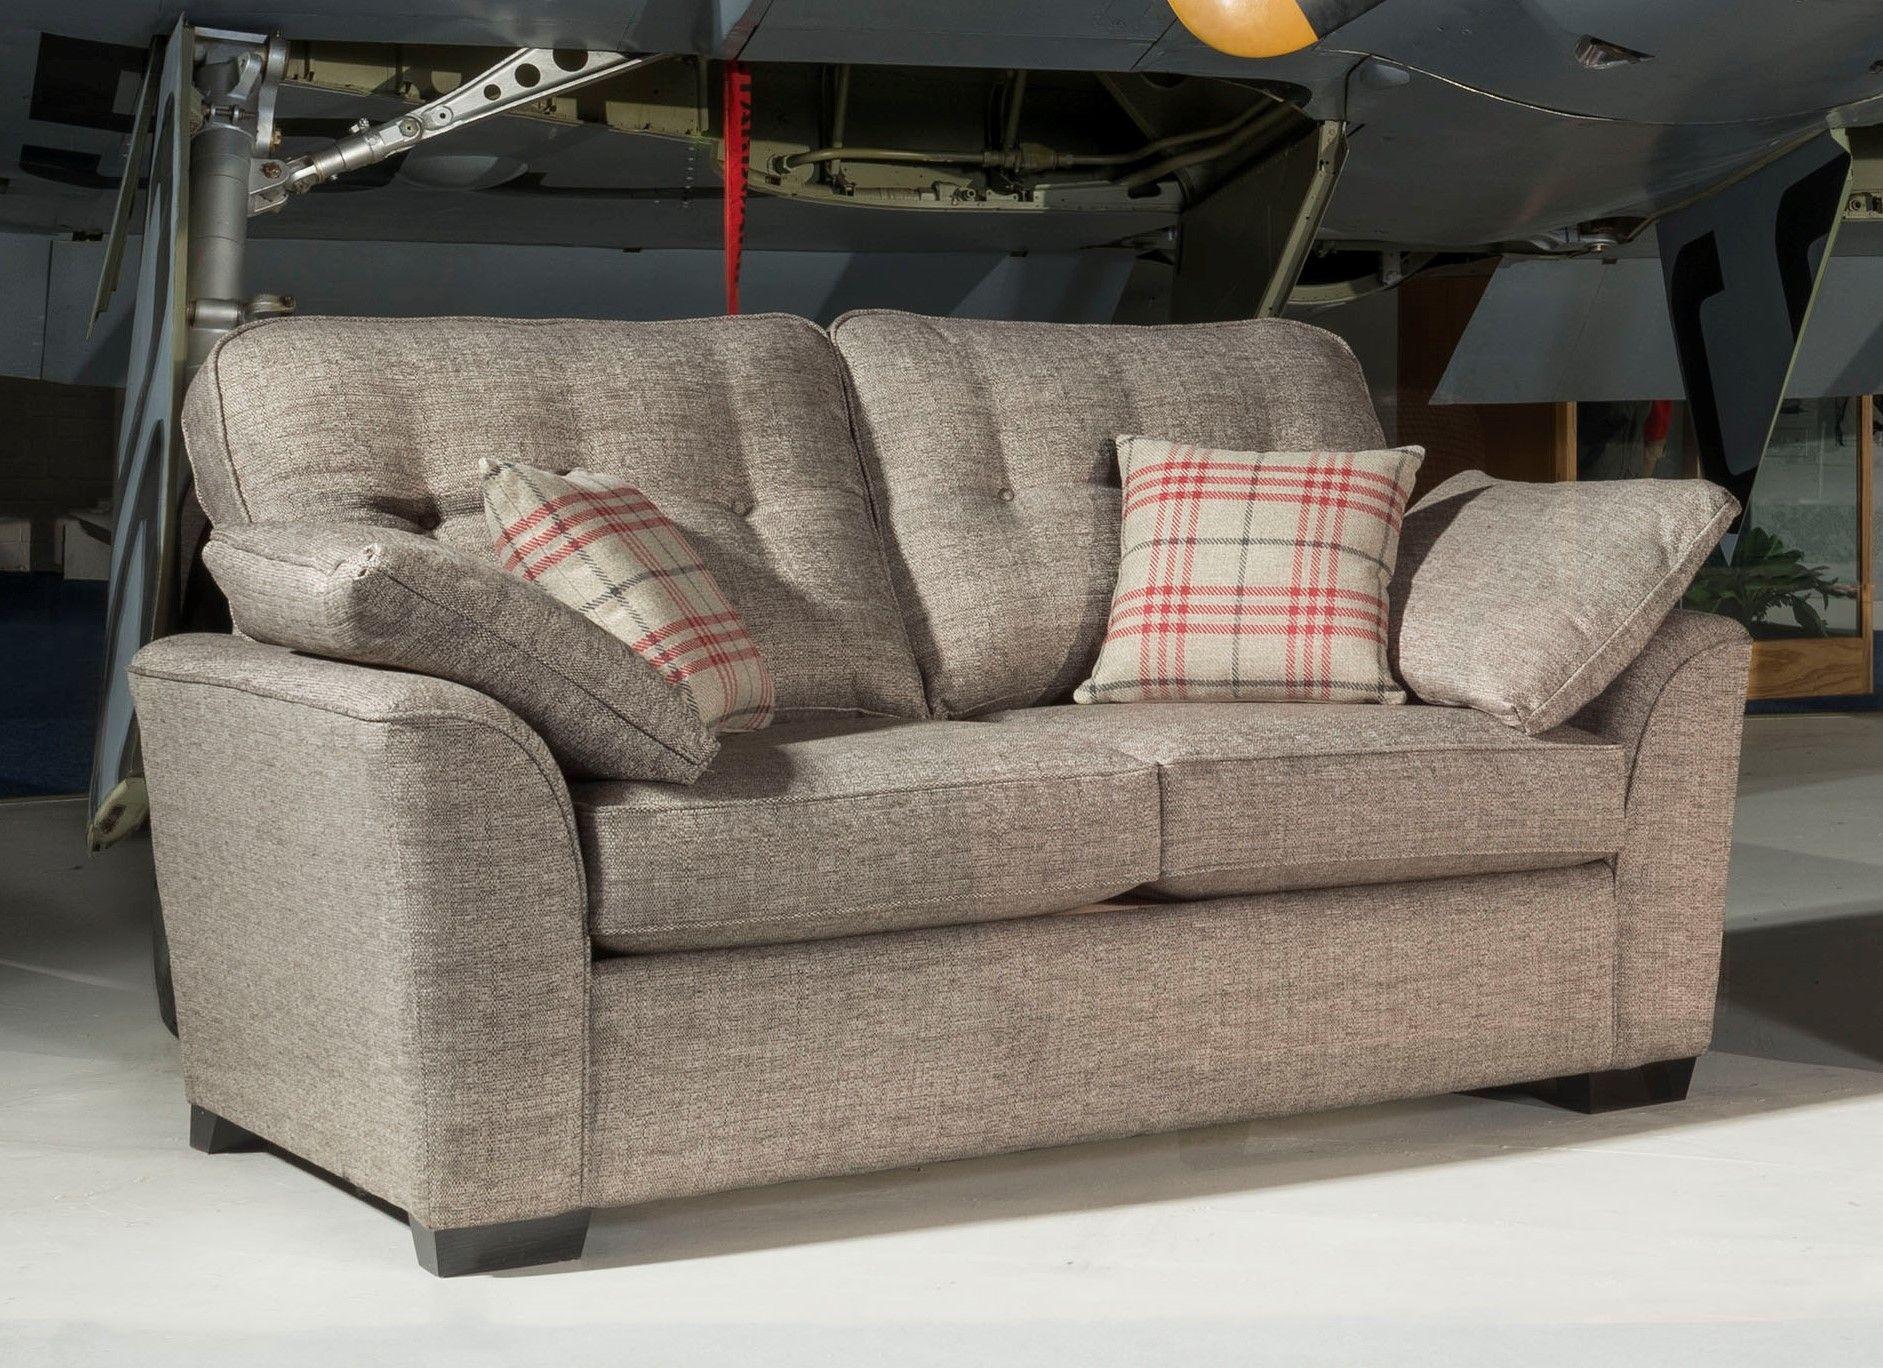 sofa beds naples florida leather wood set alstons tempest 3 seater medium sofas living homes